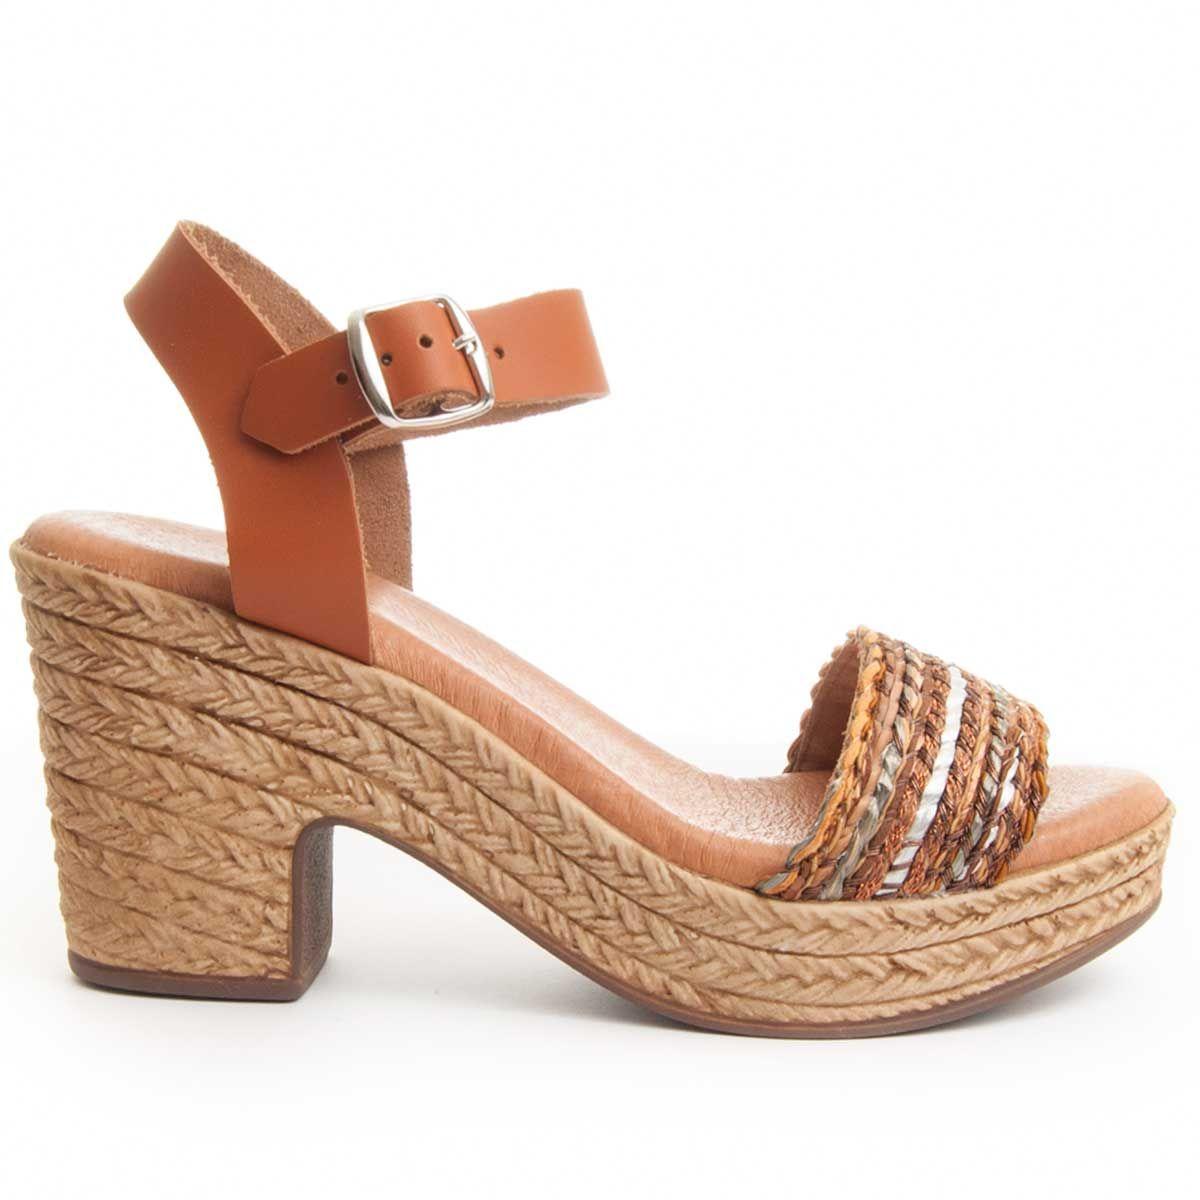 Purapiel Heel Sandal in Multicolour